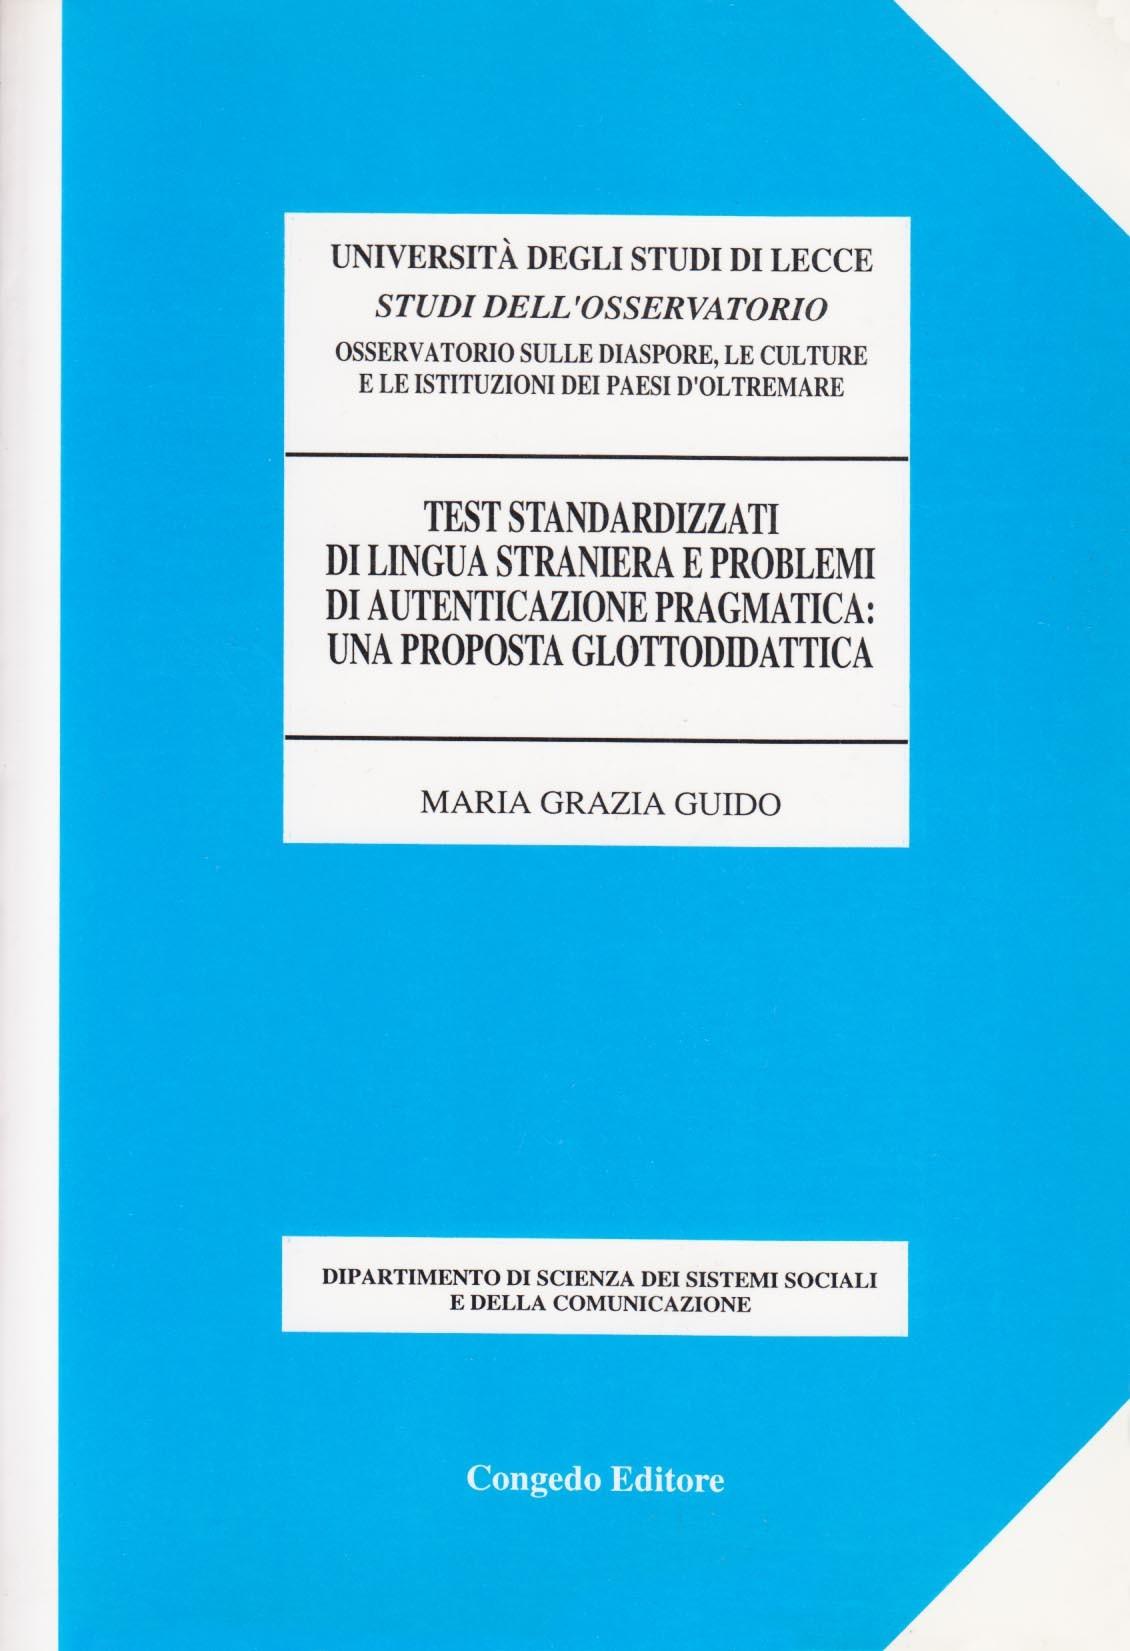 Test standardizzati di lingua straniera e problemi di autenticazione pragmatica